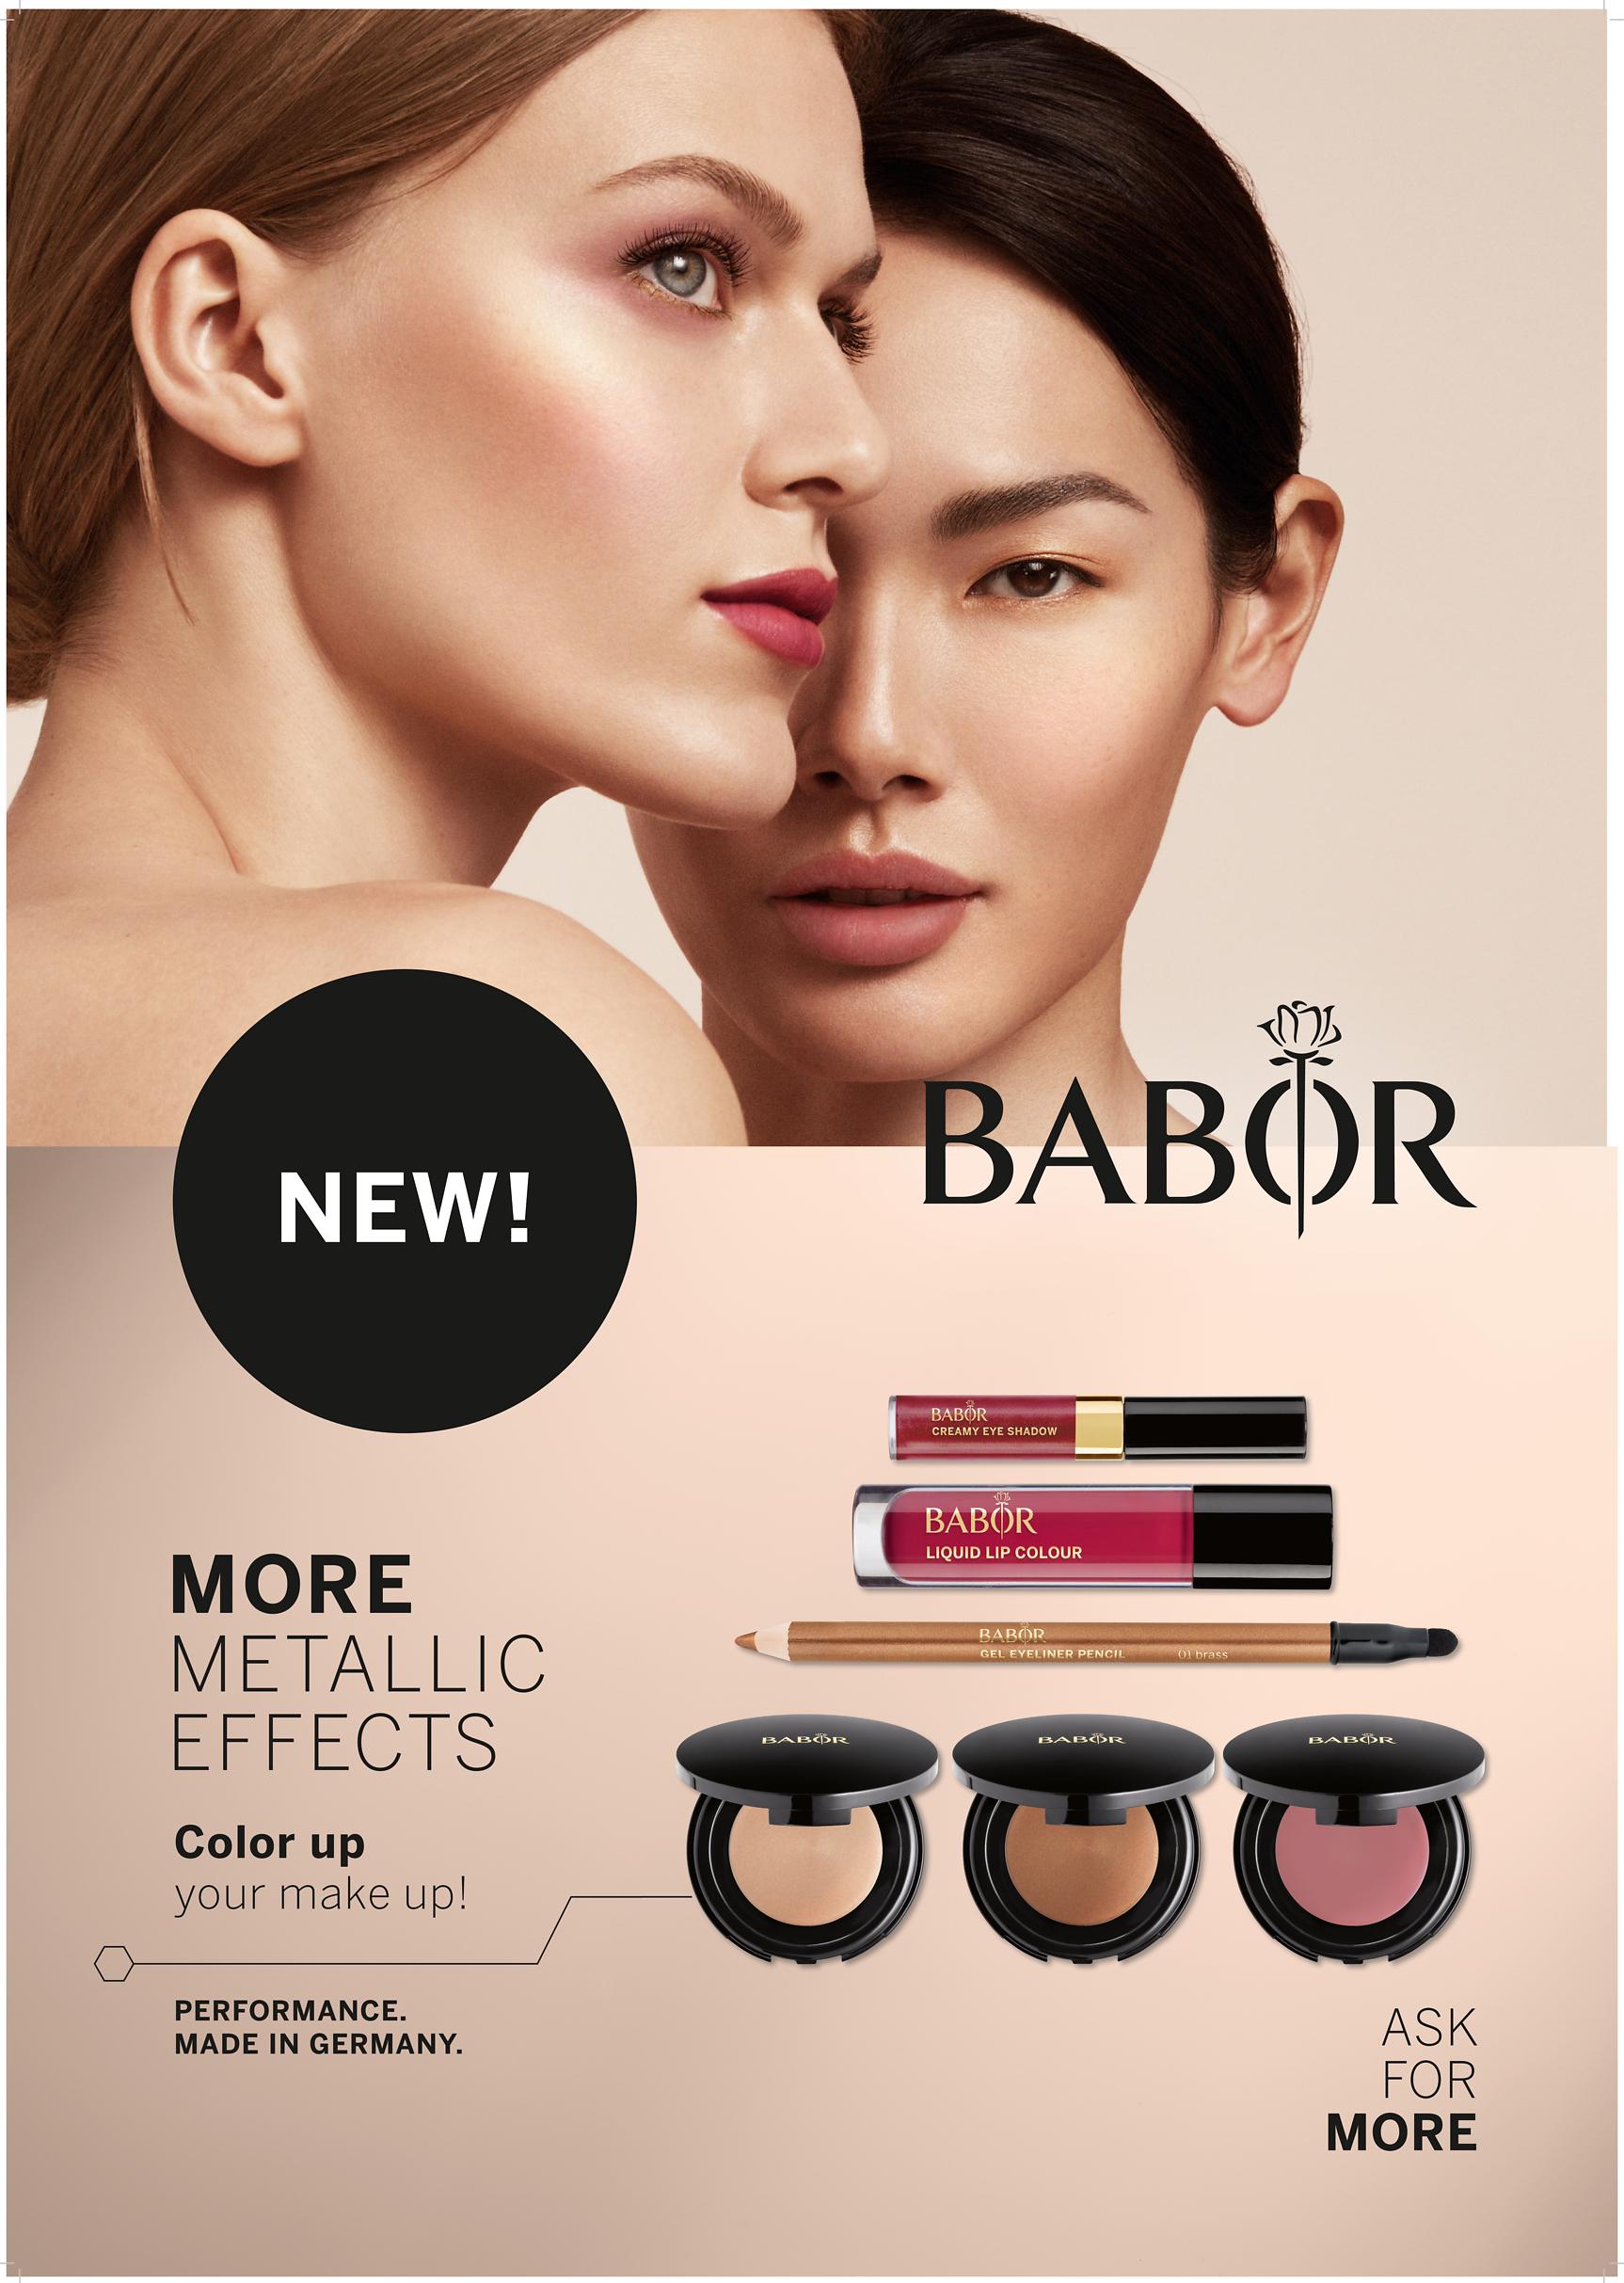 Gabriele Schreiter_Babor-Kosmetik Foam Maske